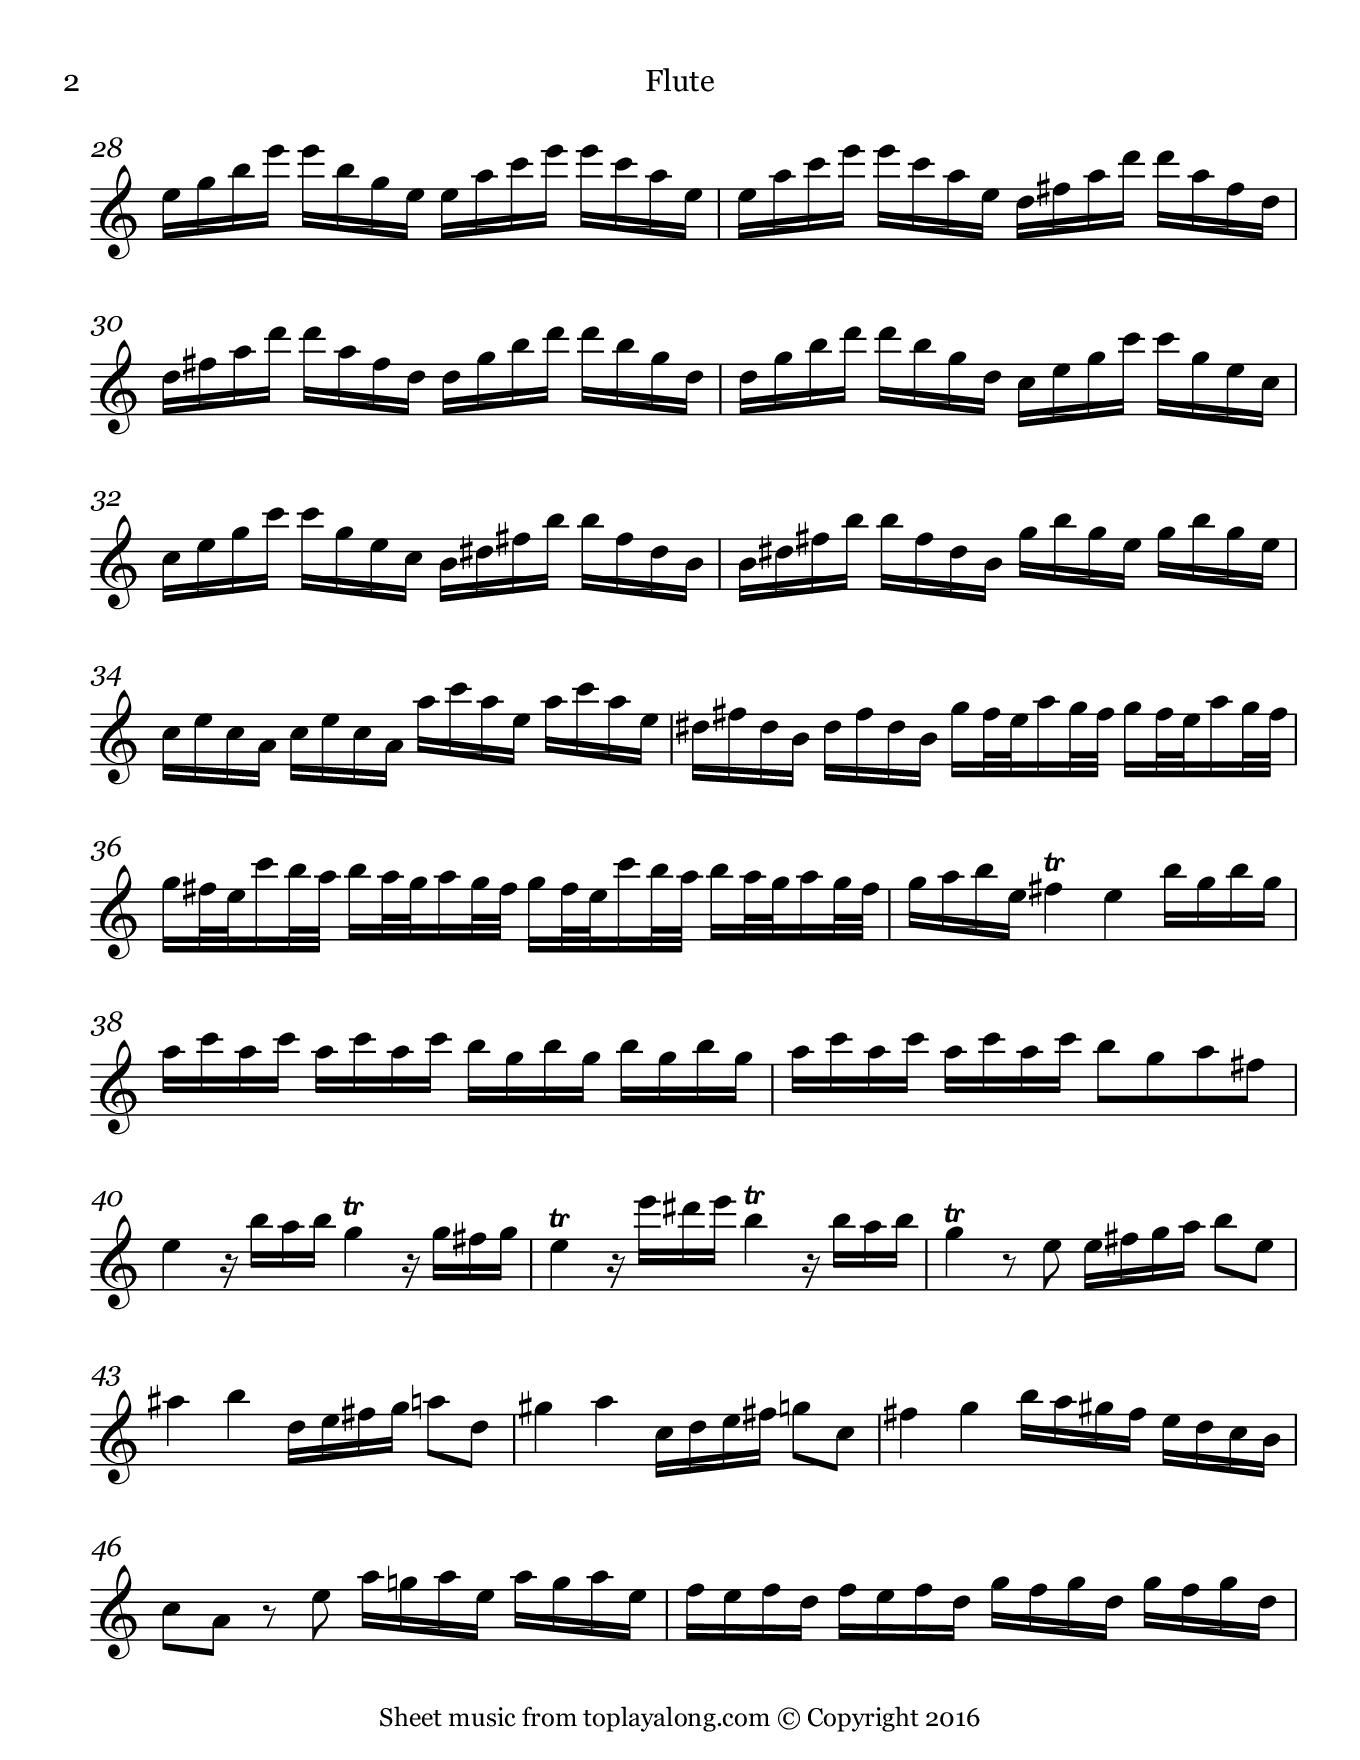 Flautino Concerto in C major RV 443 (III. Allegro molto) by Vivaldi. Sheet music for Flute, page 2.